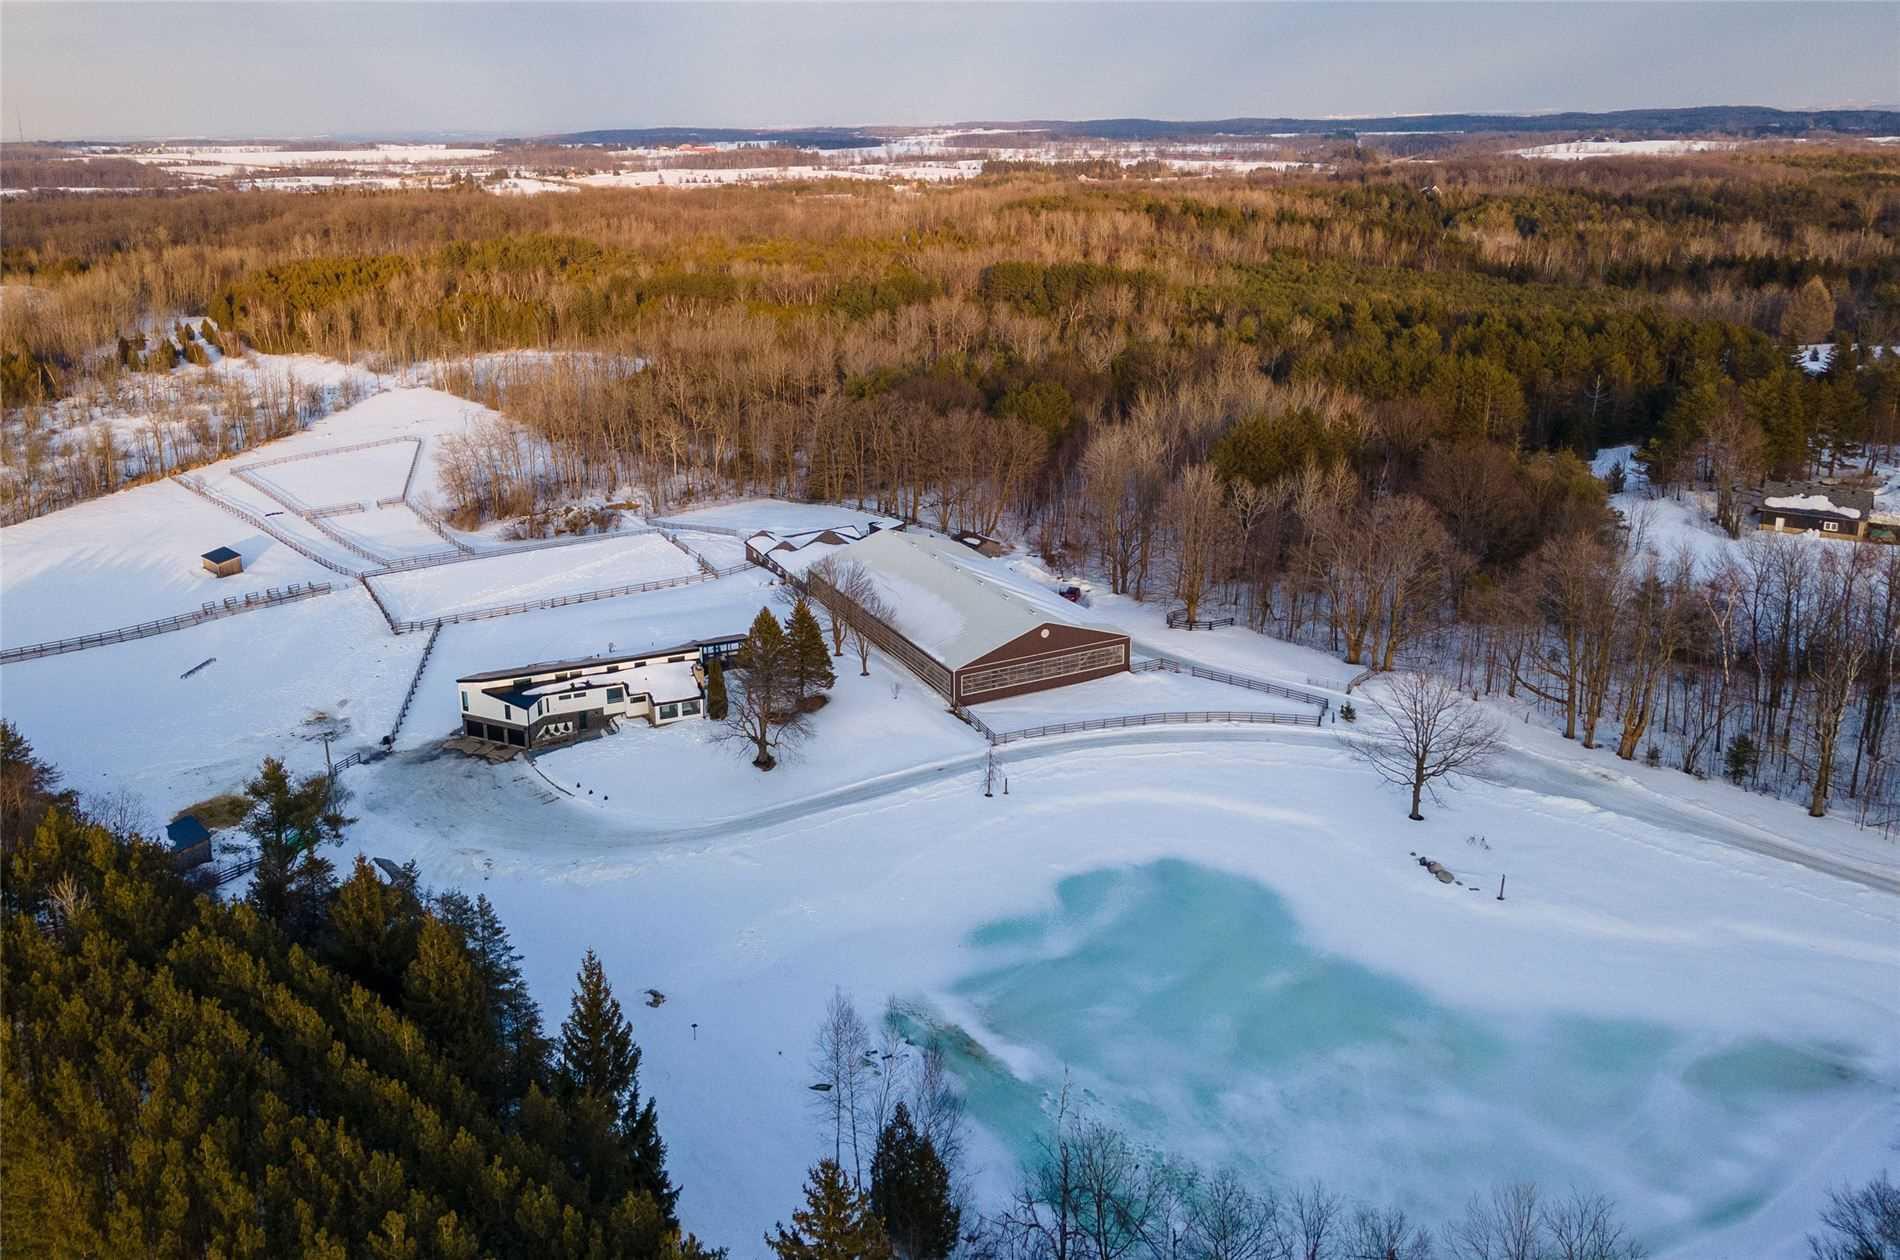 18603 Heart Lake Rd, Caledon, Ontario L7K2A5, 4 Bedrooms Bedrooms, 10 Rooms Rooms,4 BathroomsBathrooms,Detached,For Sale,Heart Lake,W5149365